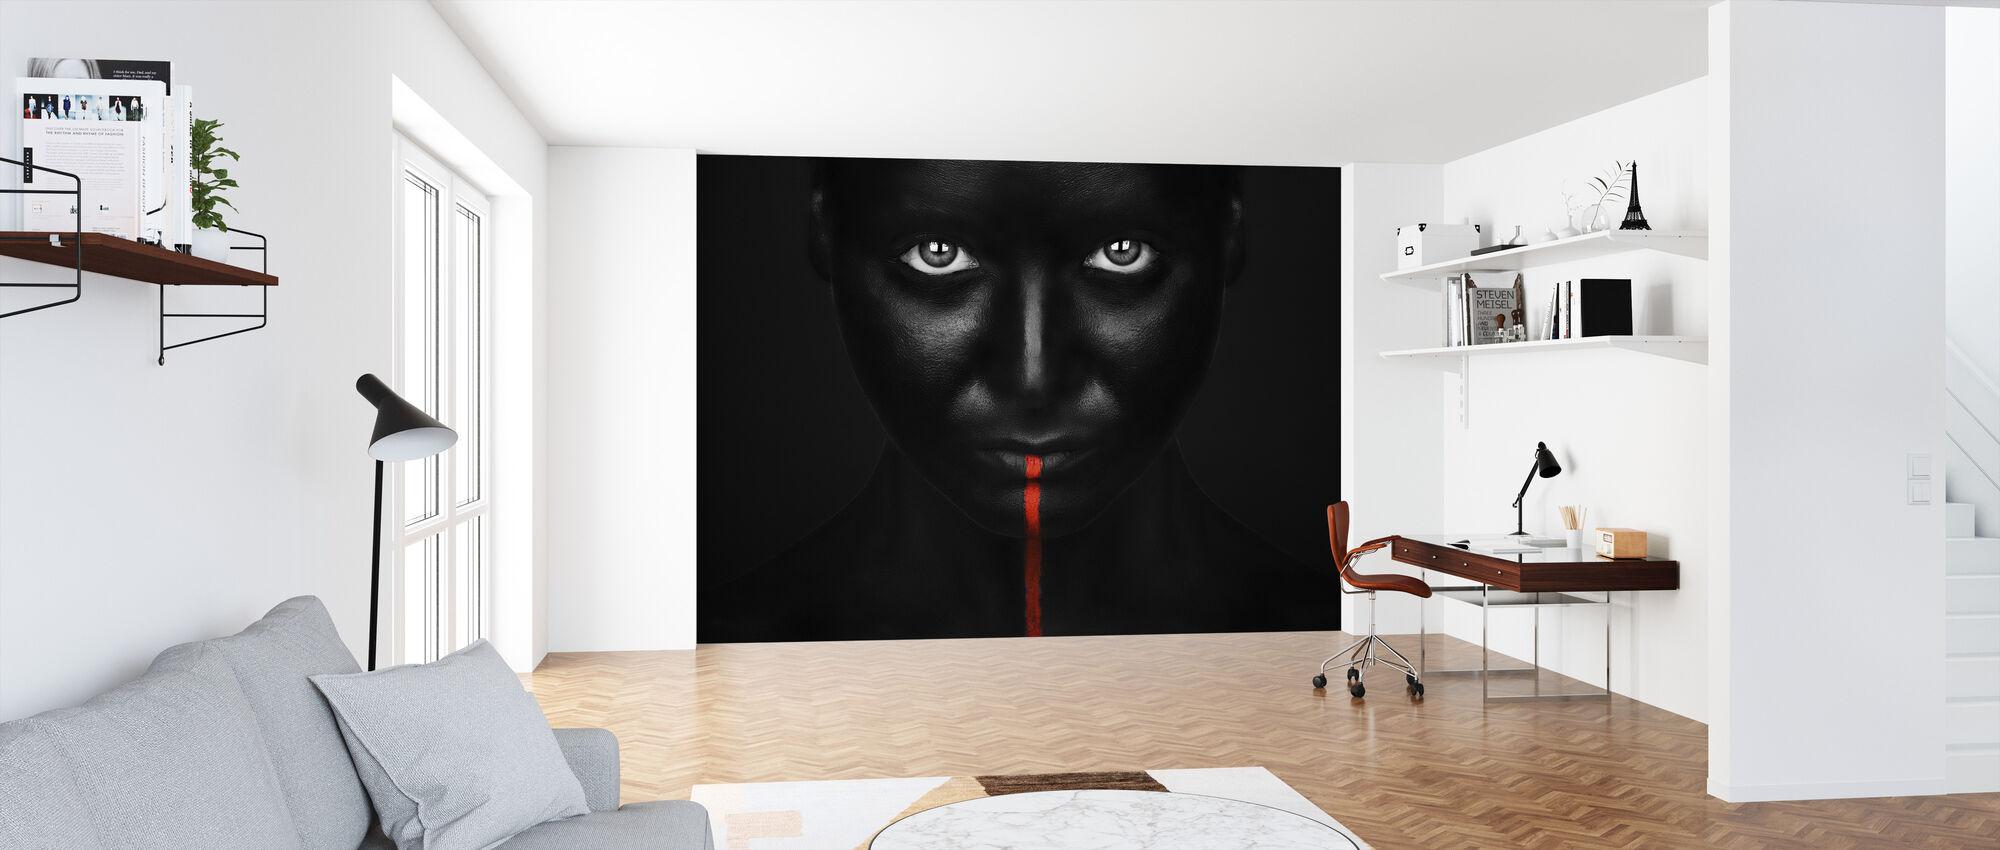 Dark Passion - Wallpaper - Office